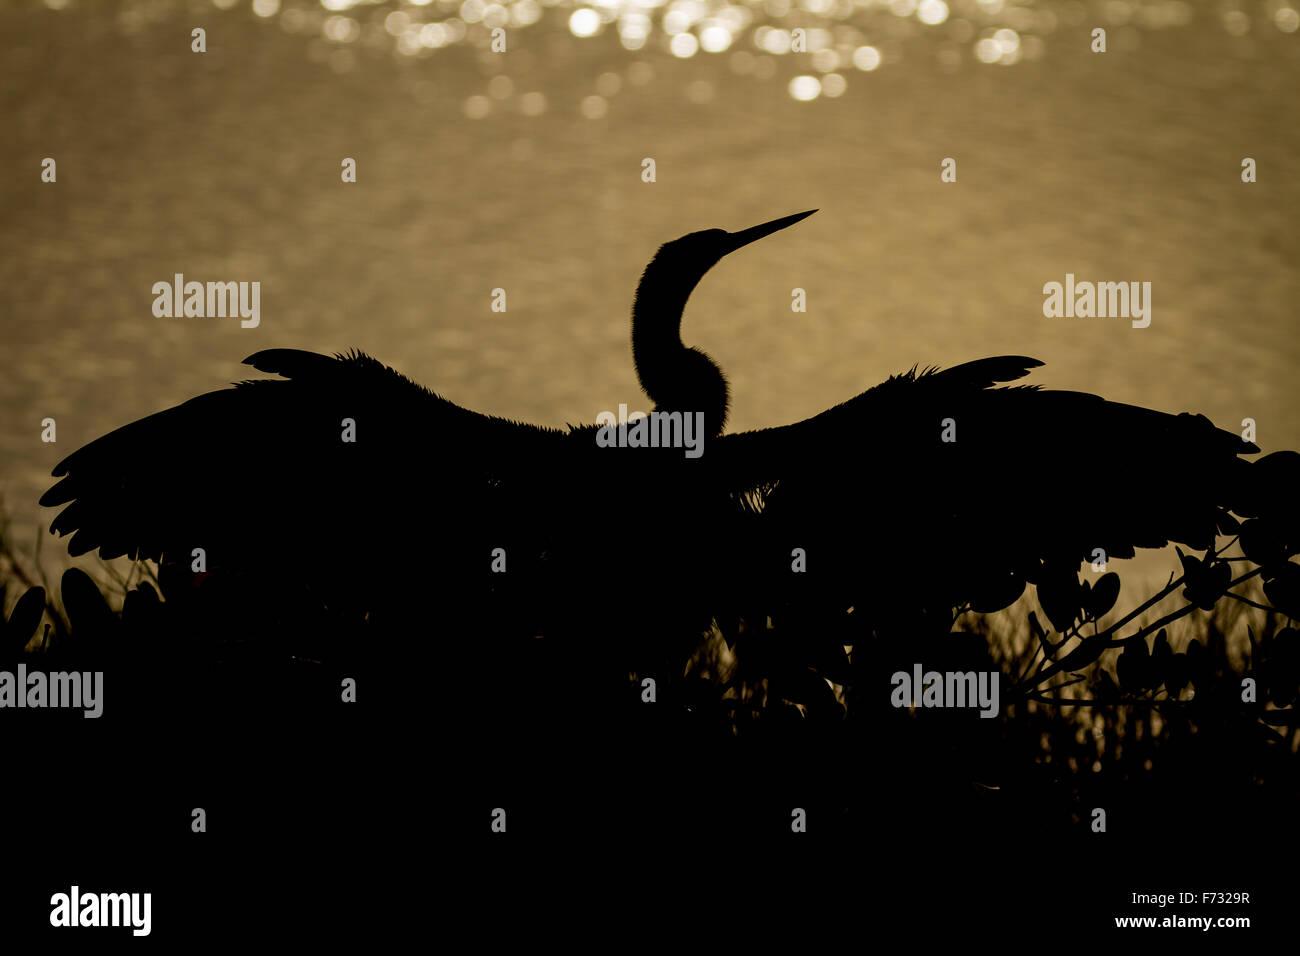 An anhinga silhouette - Stock Image